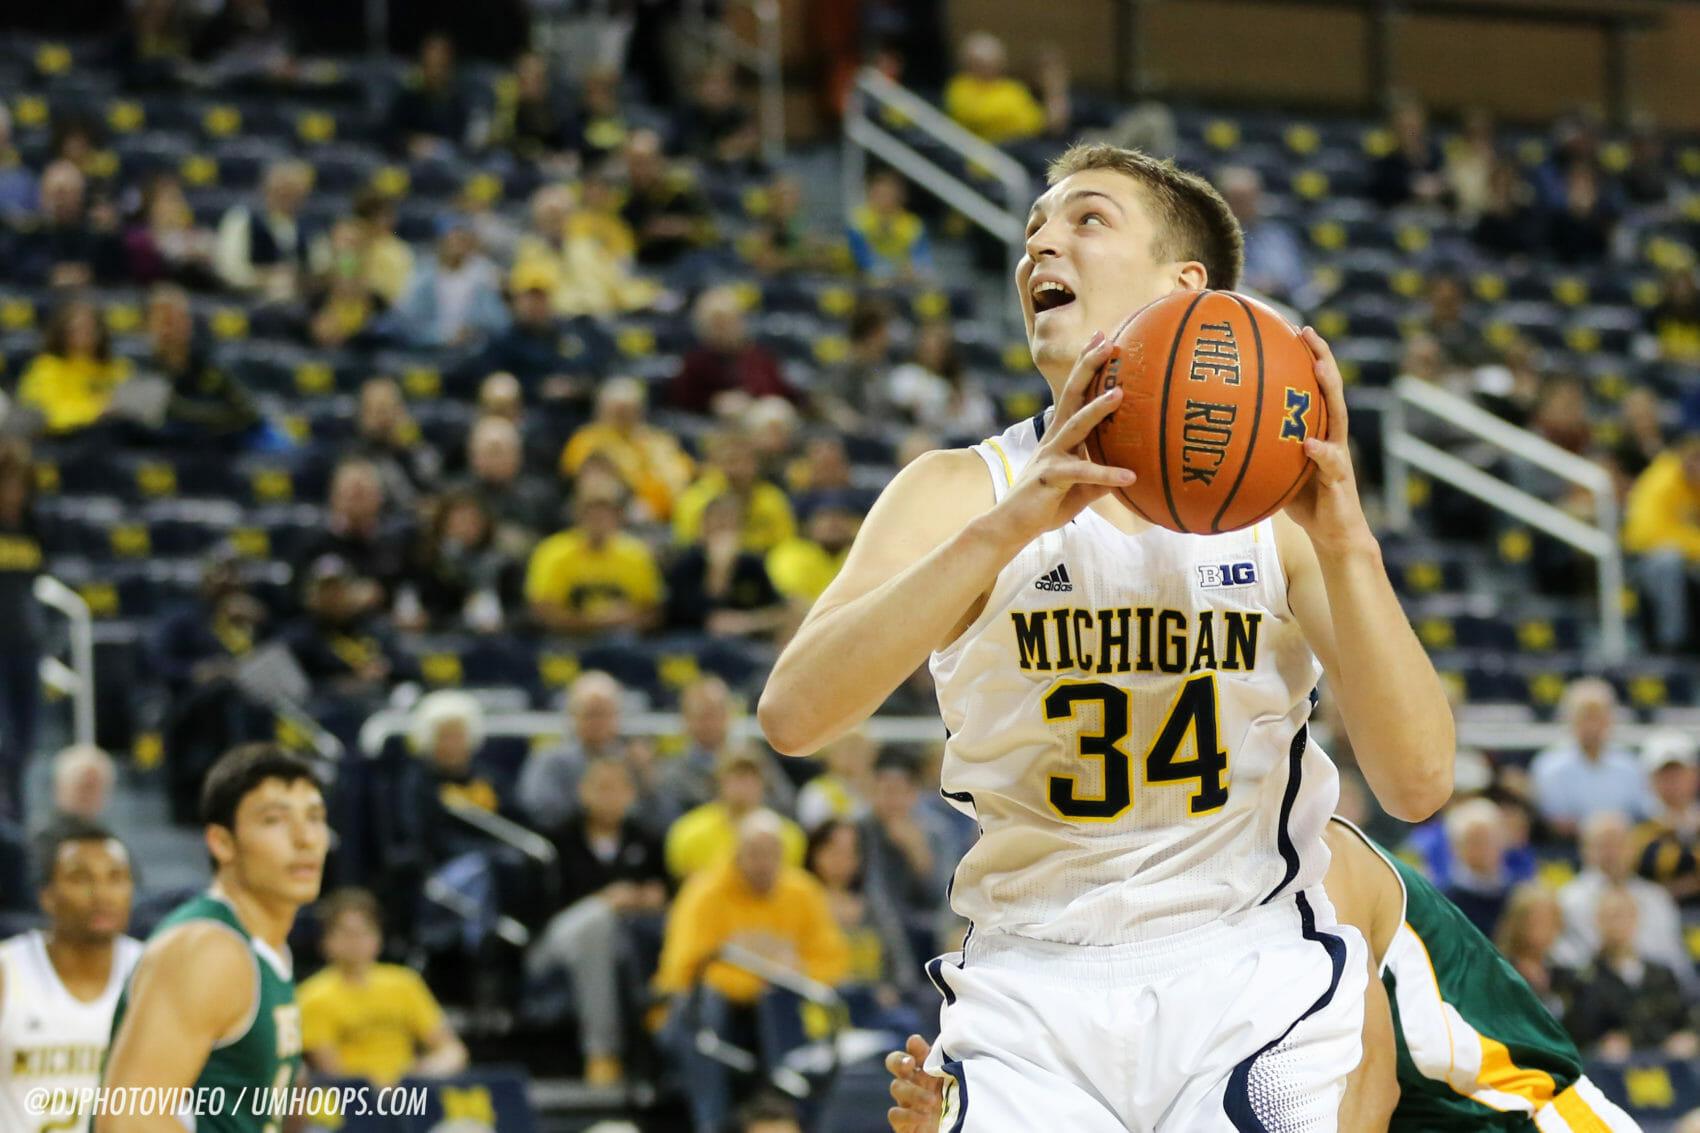 Michigan 86, Wayne State 43-3